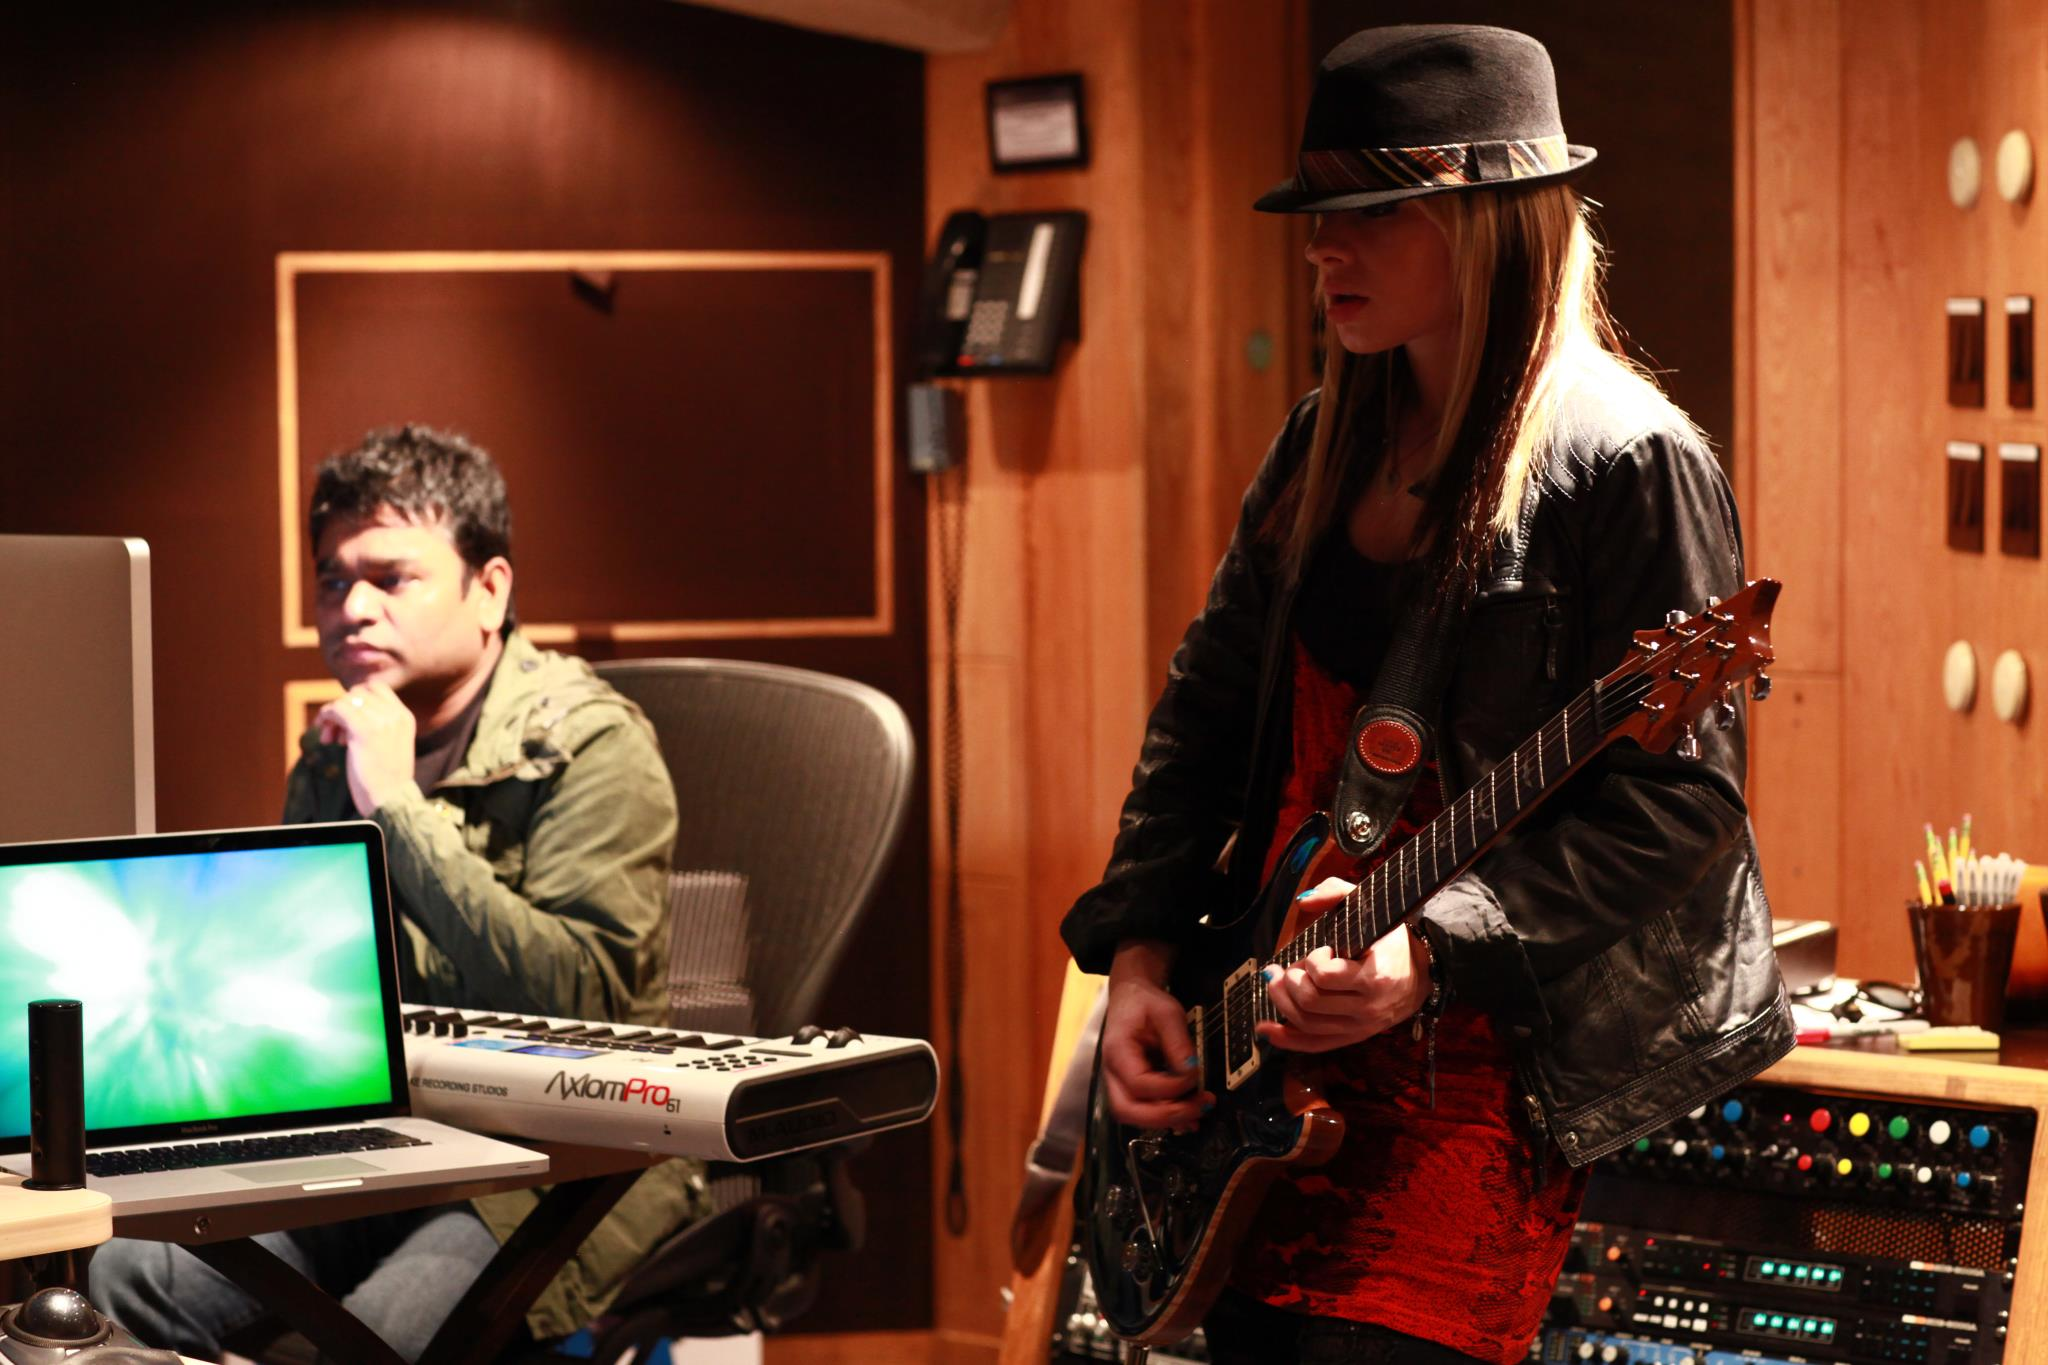 A.R.Rahman_with_Orianthi_during_the_recording_of_Sadda_Haq.jpg